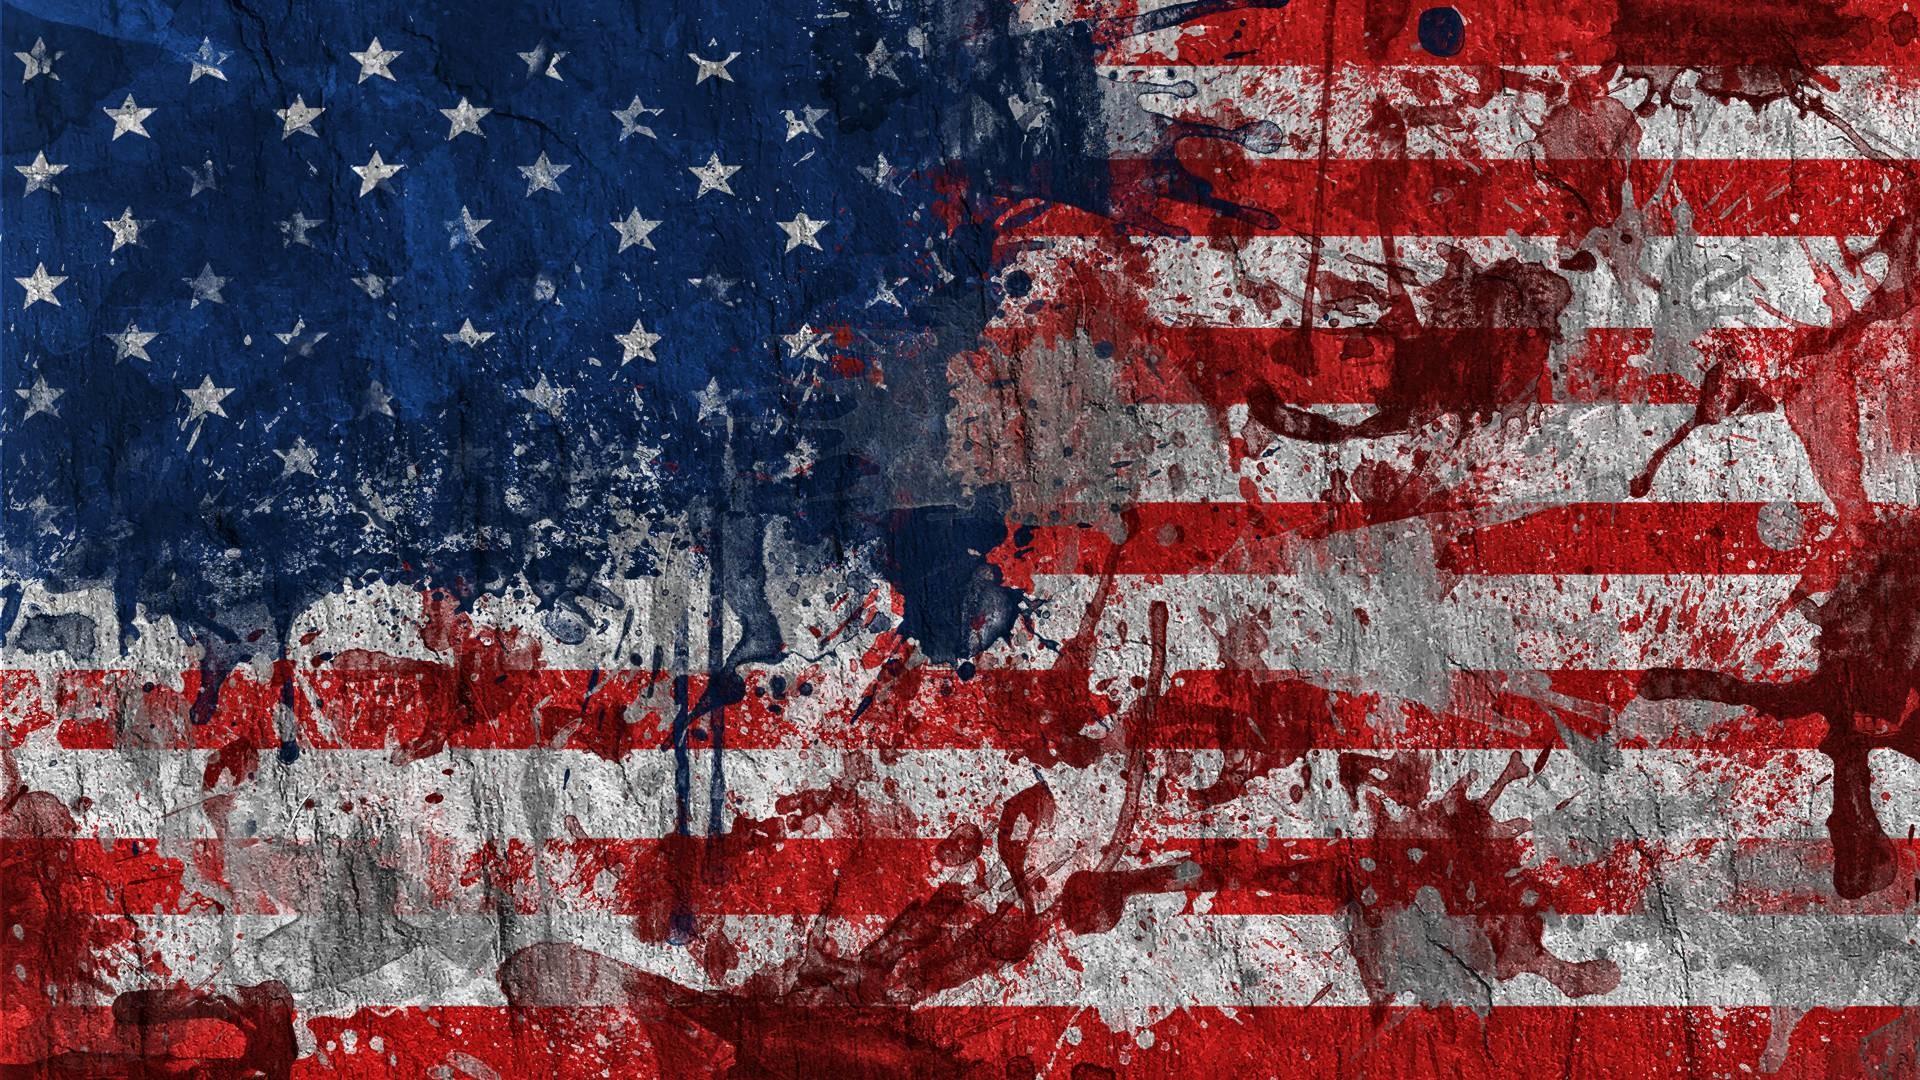 Art Painting American Flag Wallpaper HD #8548 Wallpaper | High .